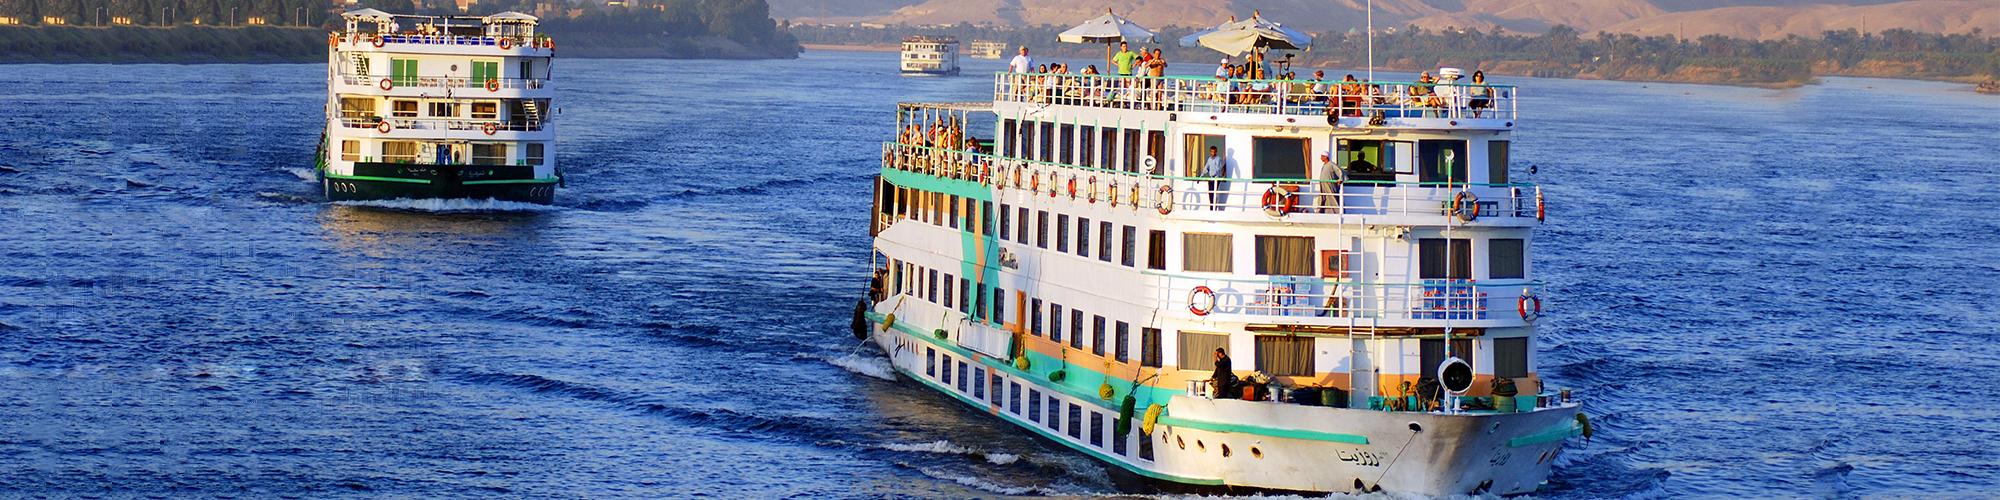 Nile Cruise from Makadi Bay - Tours From Hurghada